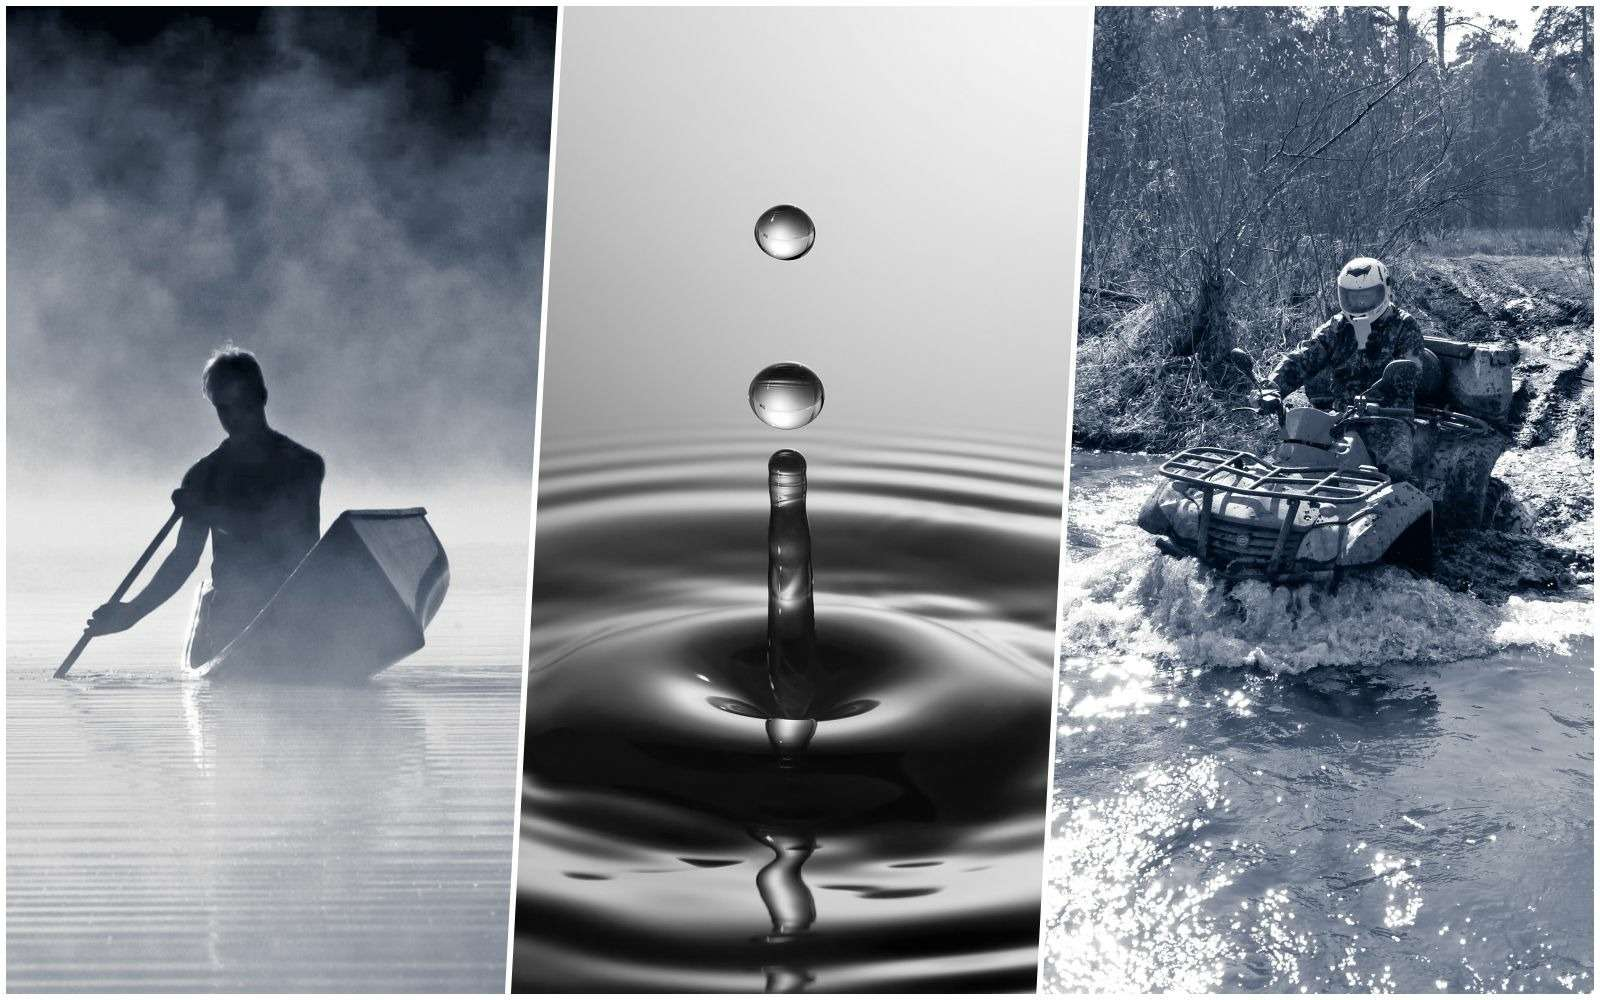 Вода против автомобиля. 8задачек ЗР— фото 784773